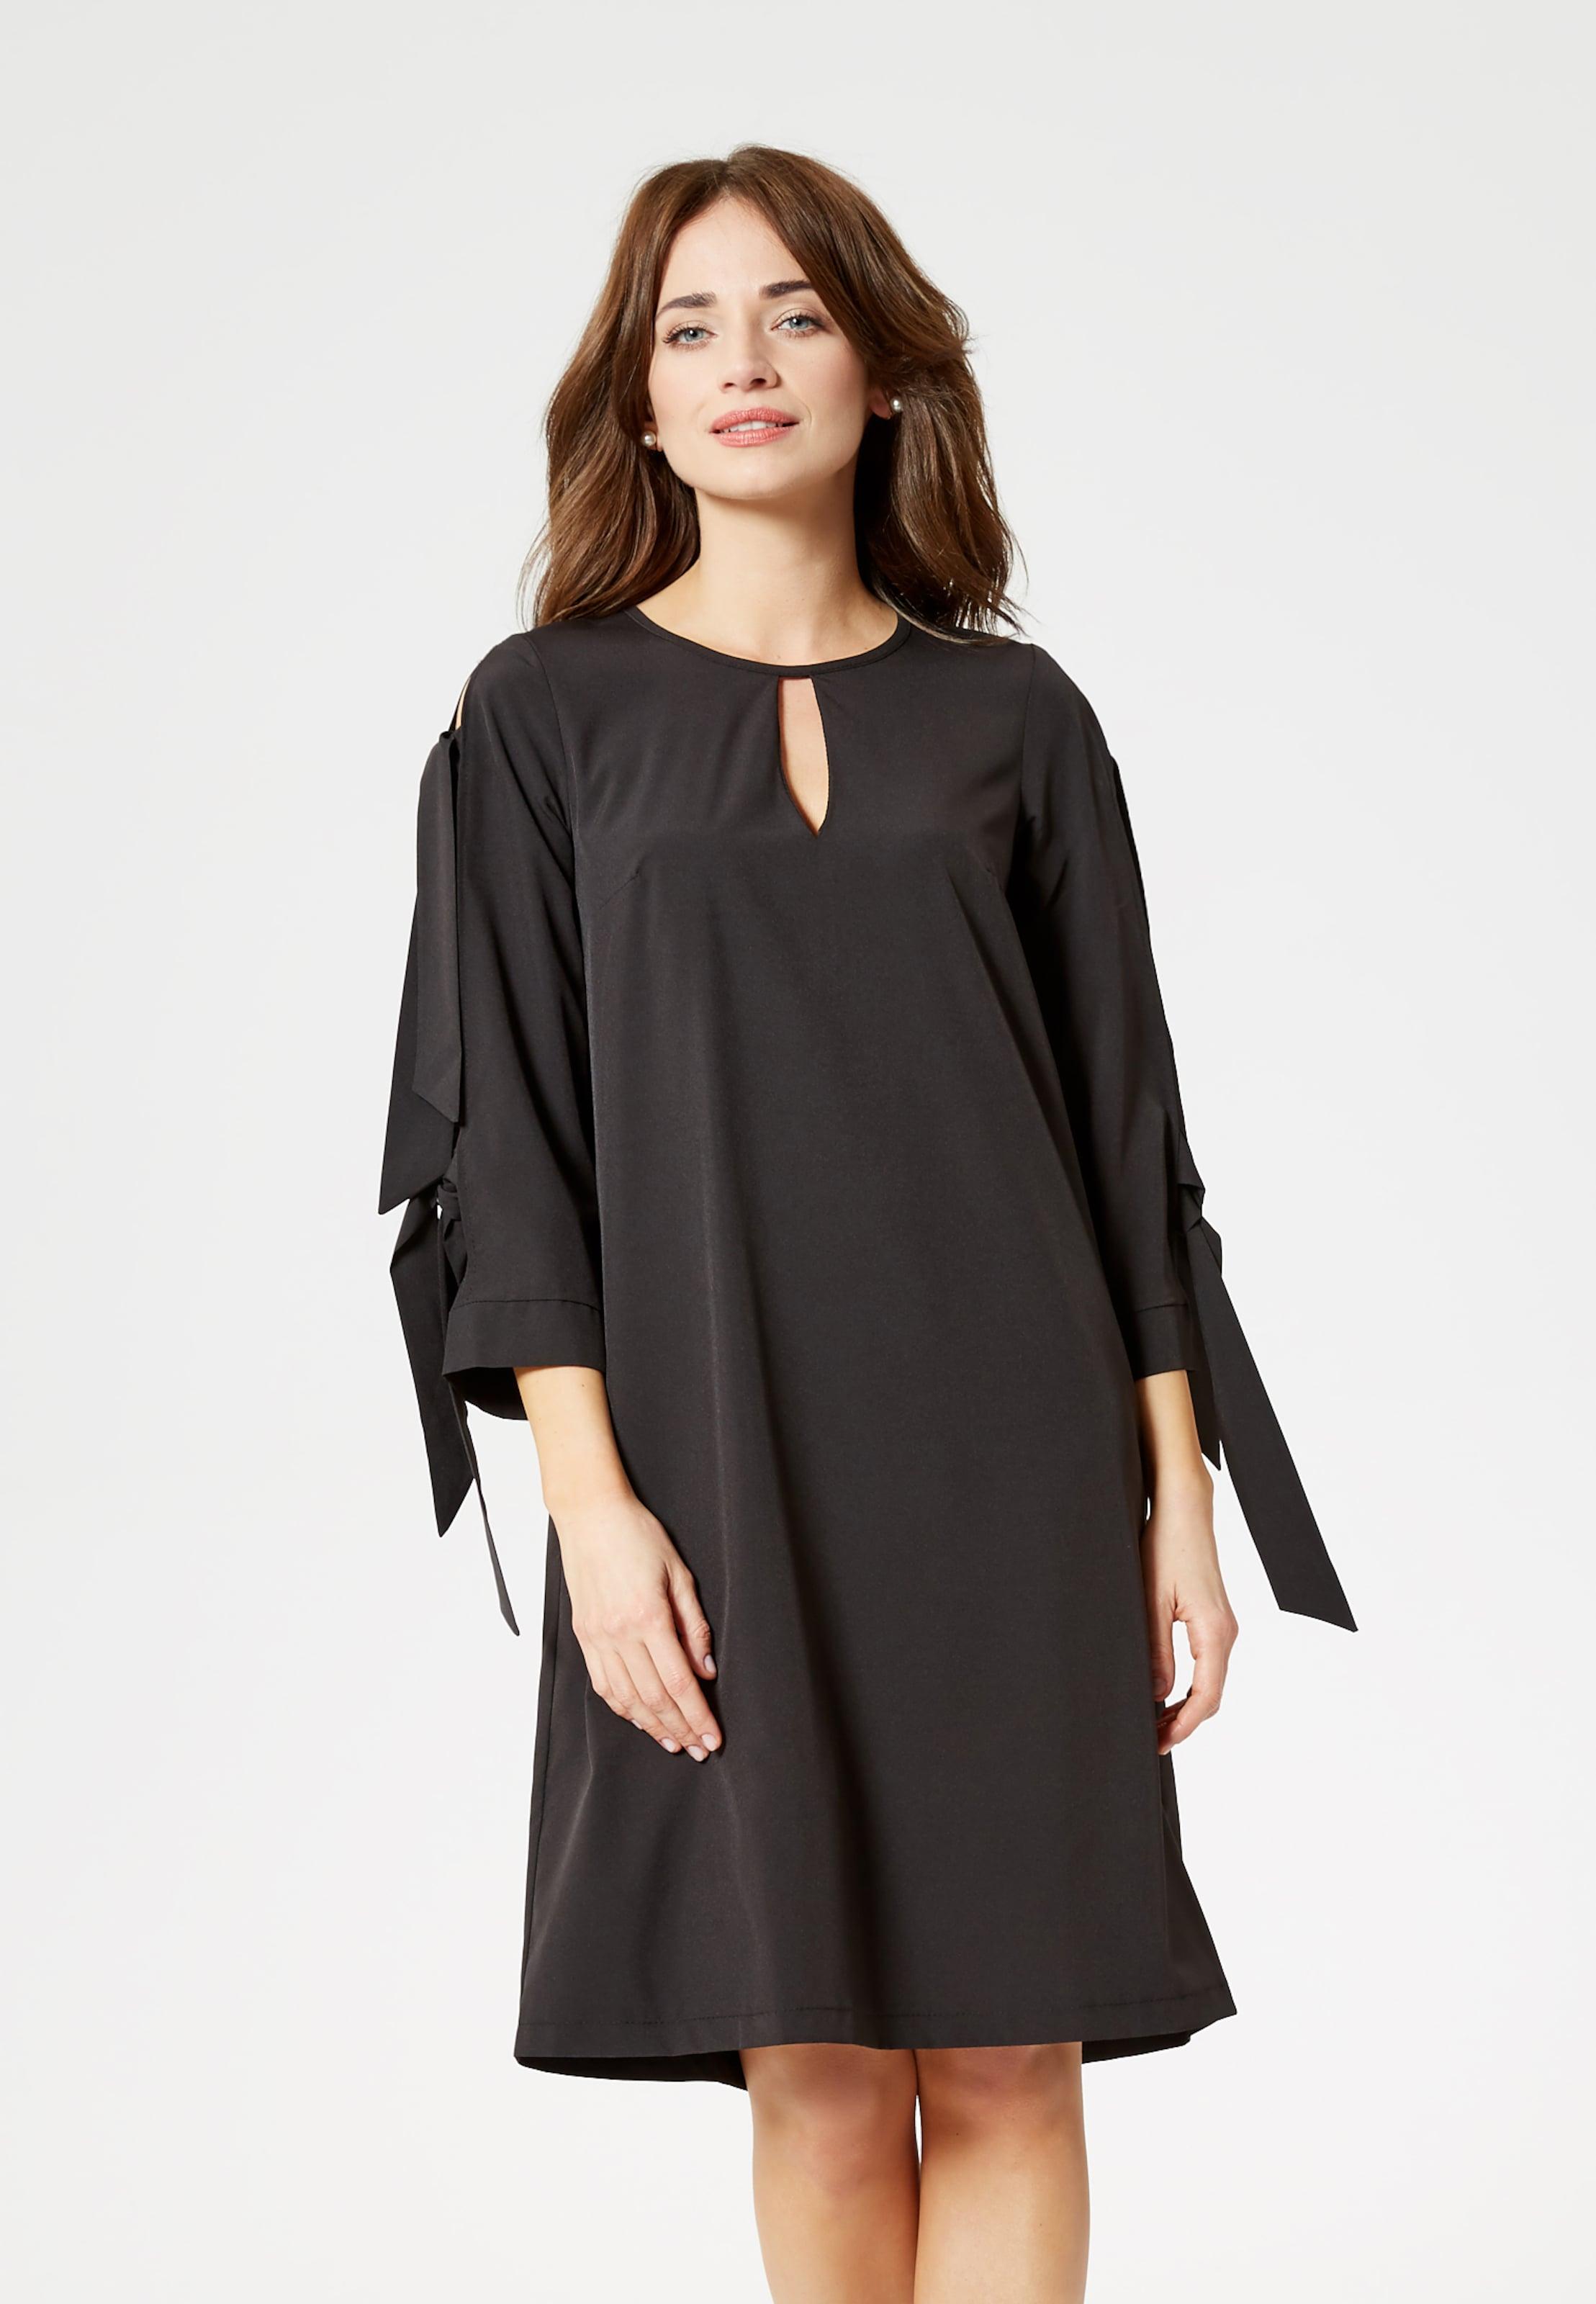 chemise Robe chemise Usha Noir En Robe Usha En l3cTFK1J5u